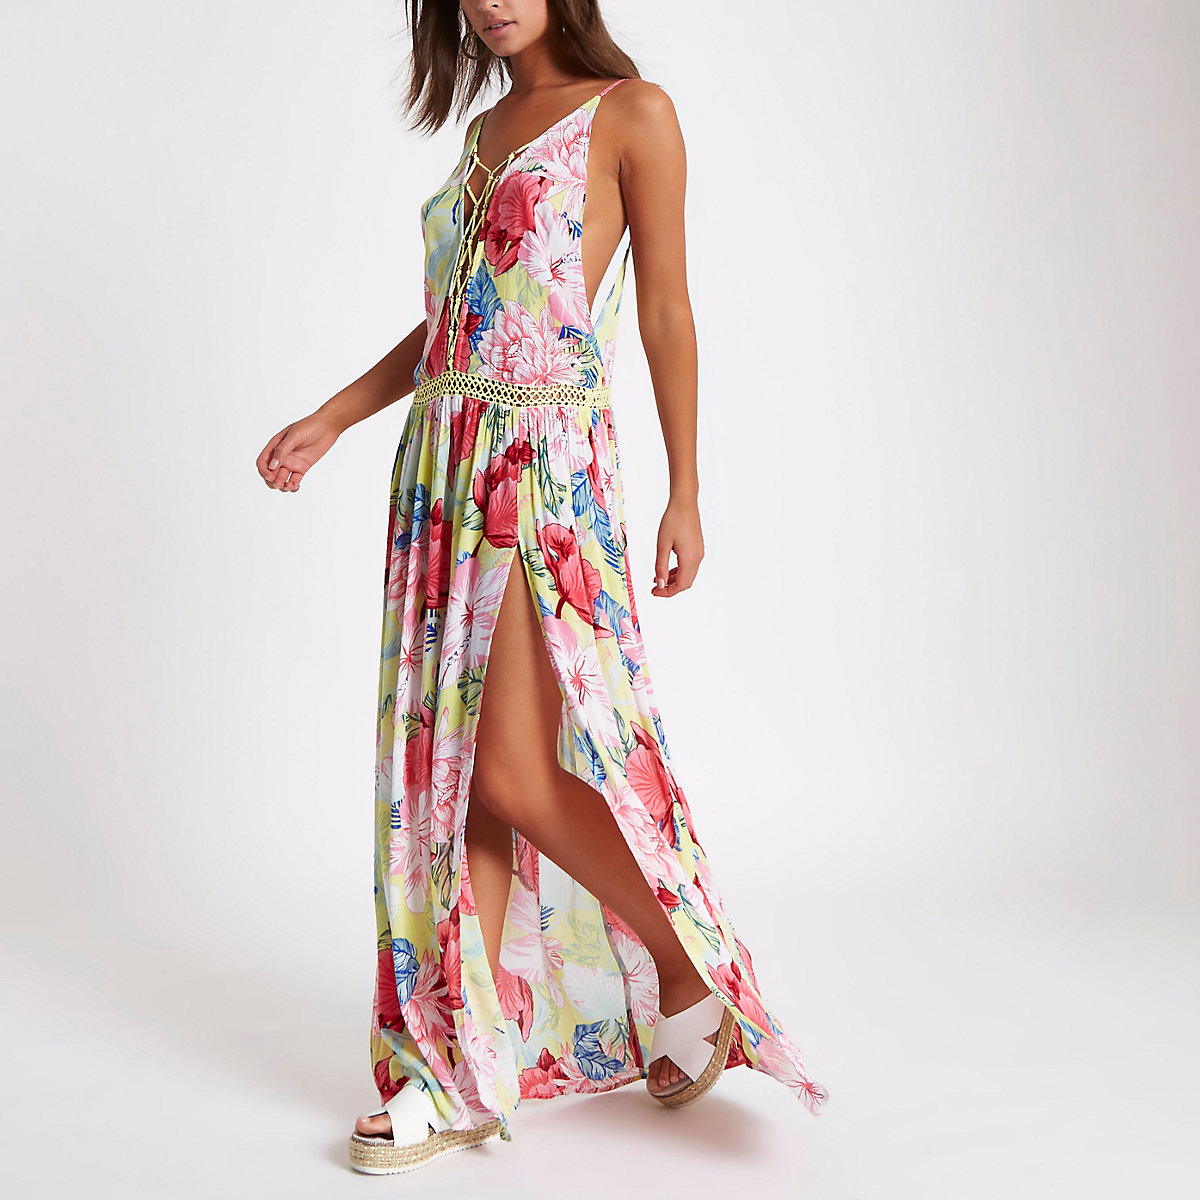 d96892a7cd6 Pink crochet tropical print maxi beach dress - Kaftans   Beach Cover-Ups -  Swimwear   Beachwear - women